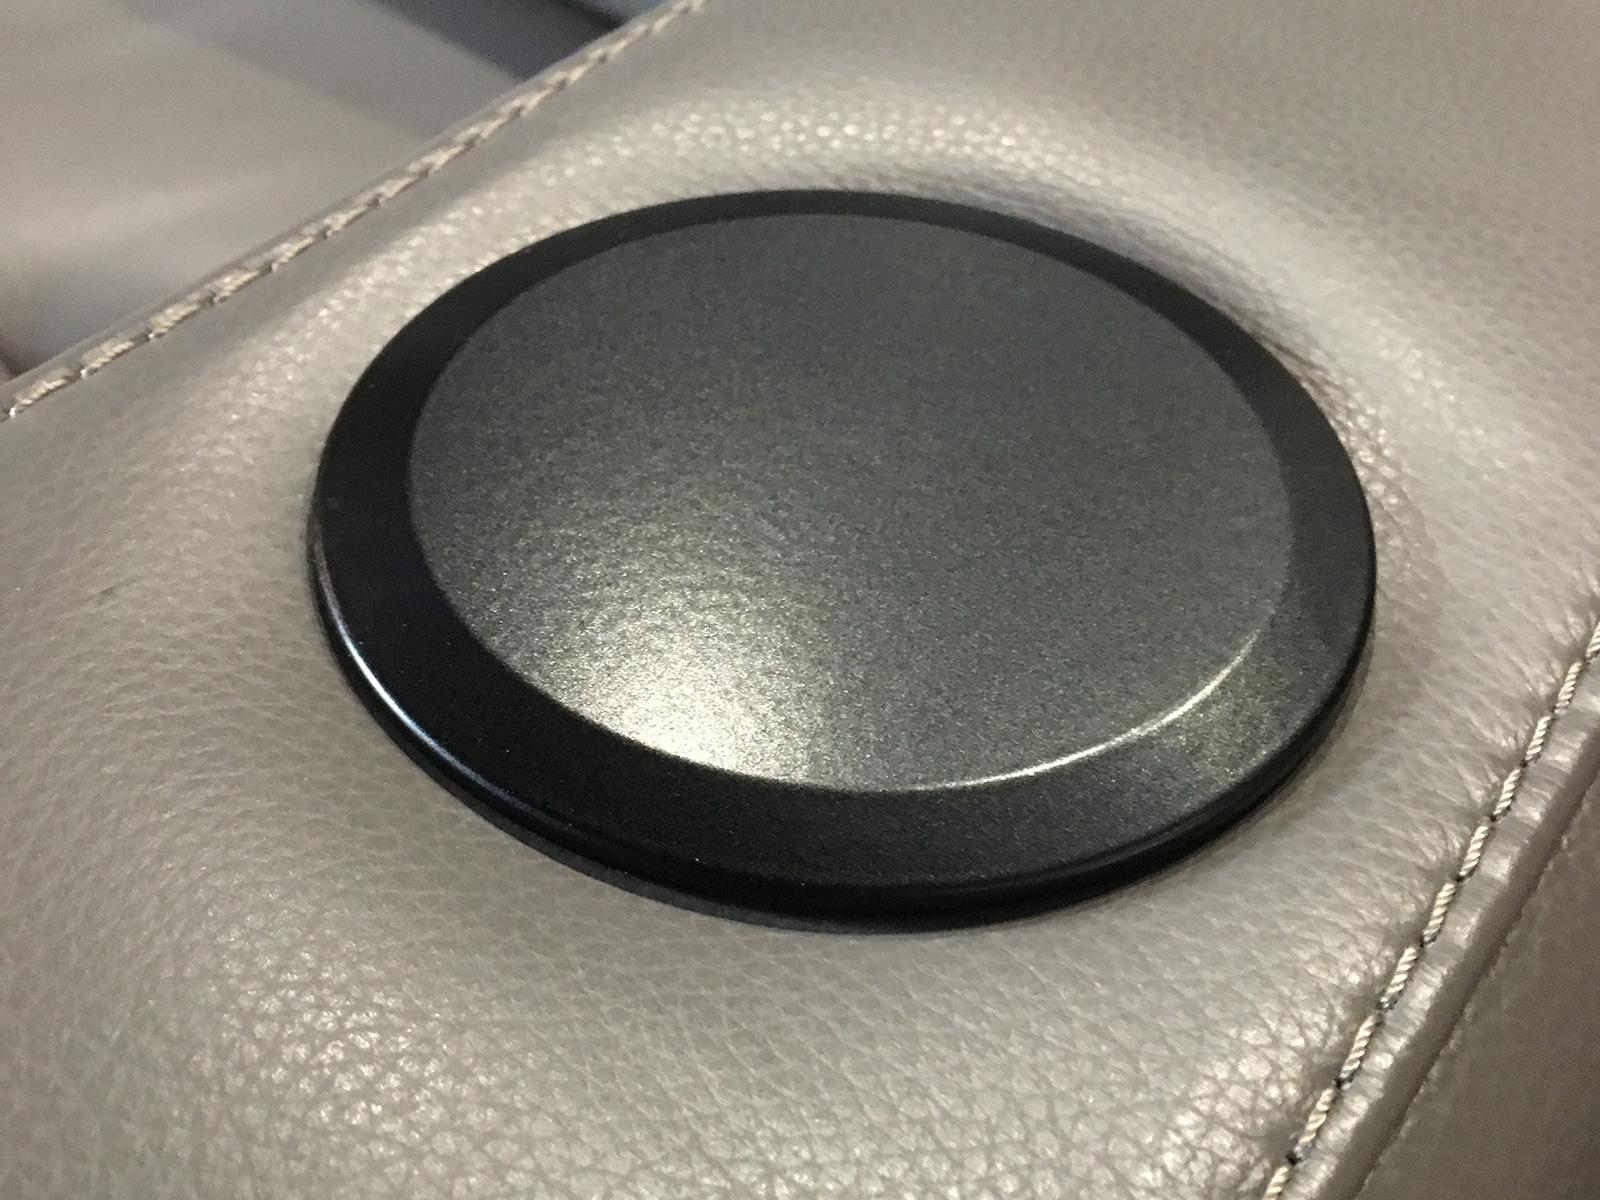 Cupholder caps